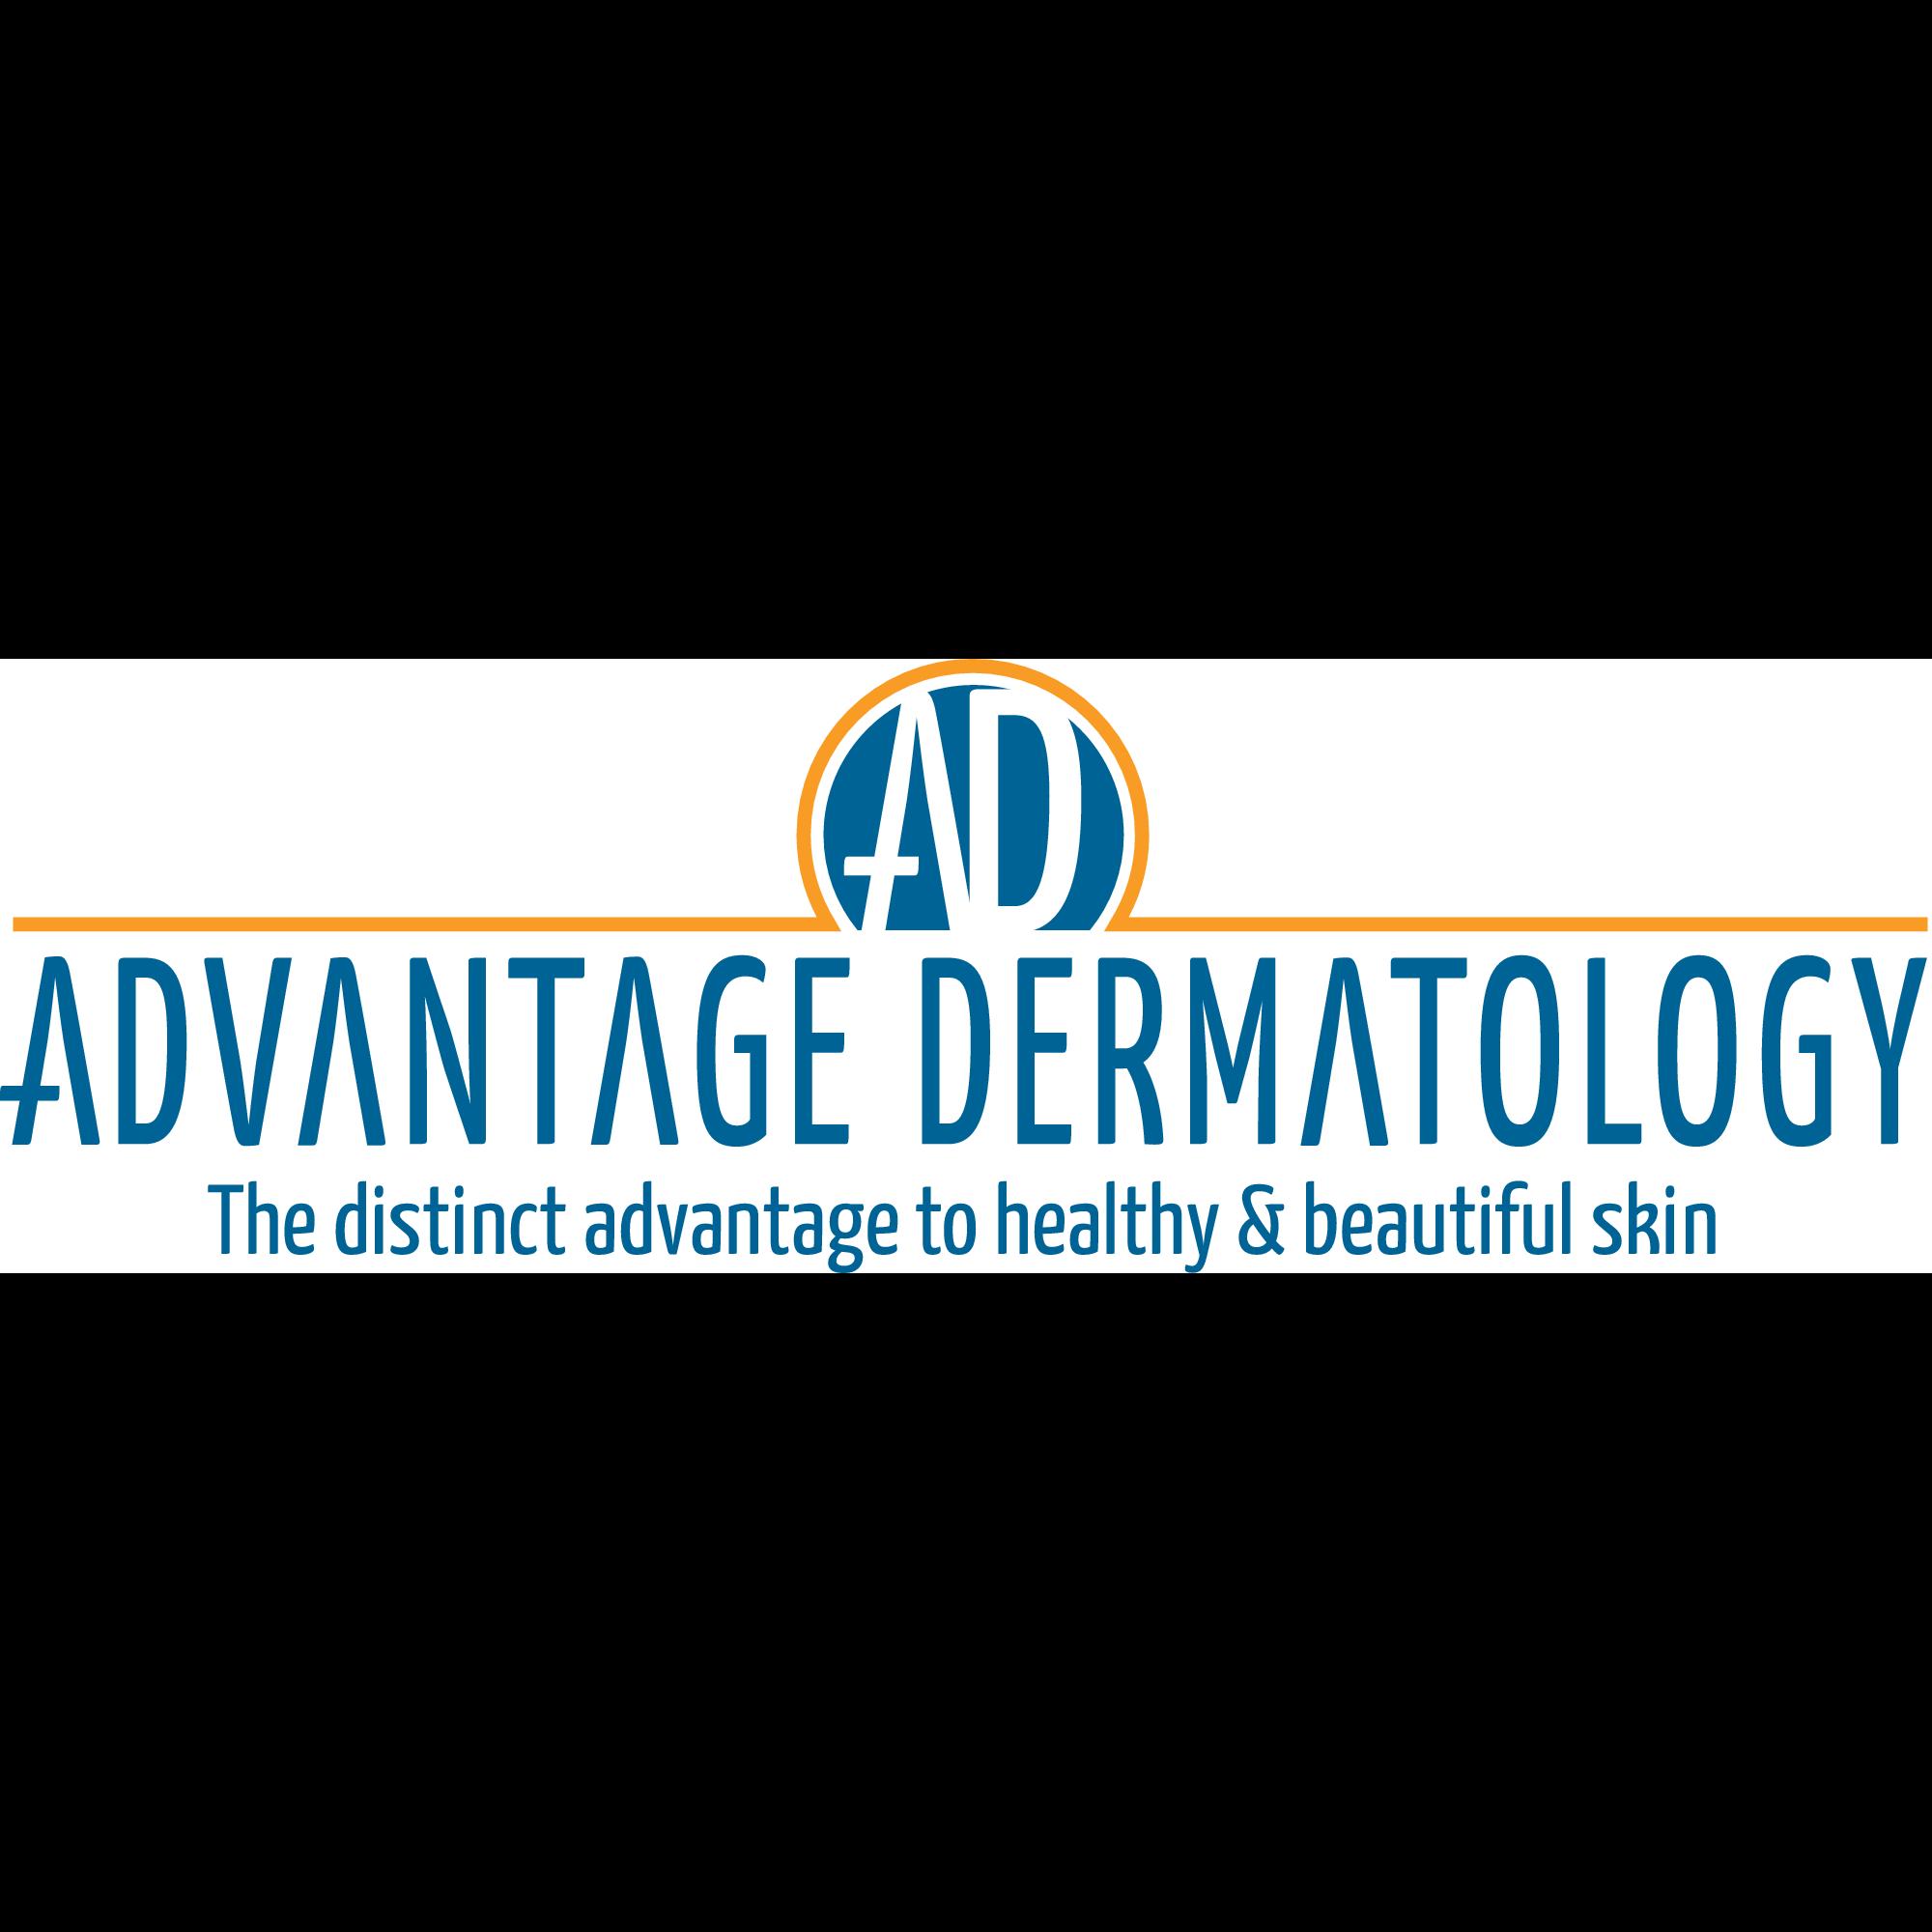 Advantage Dermatology - Jacksonville, FL - Dermatologists